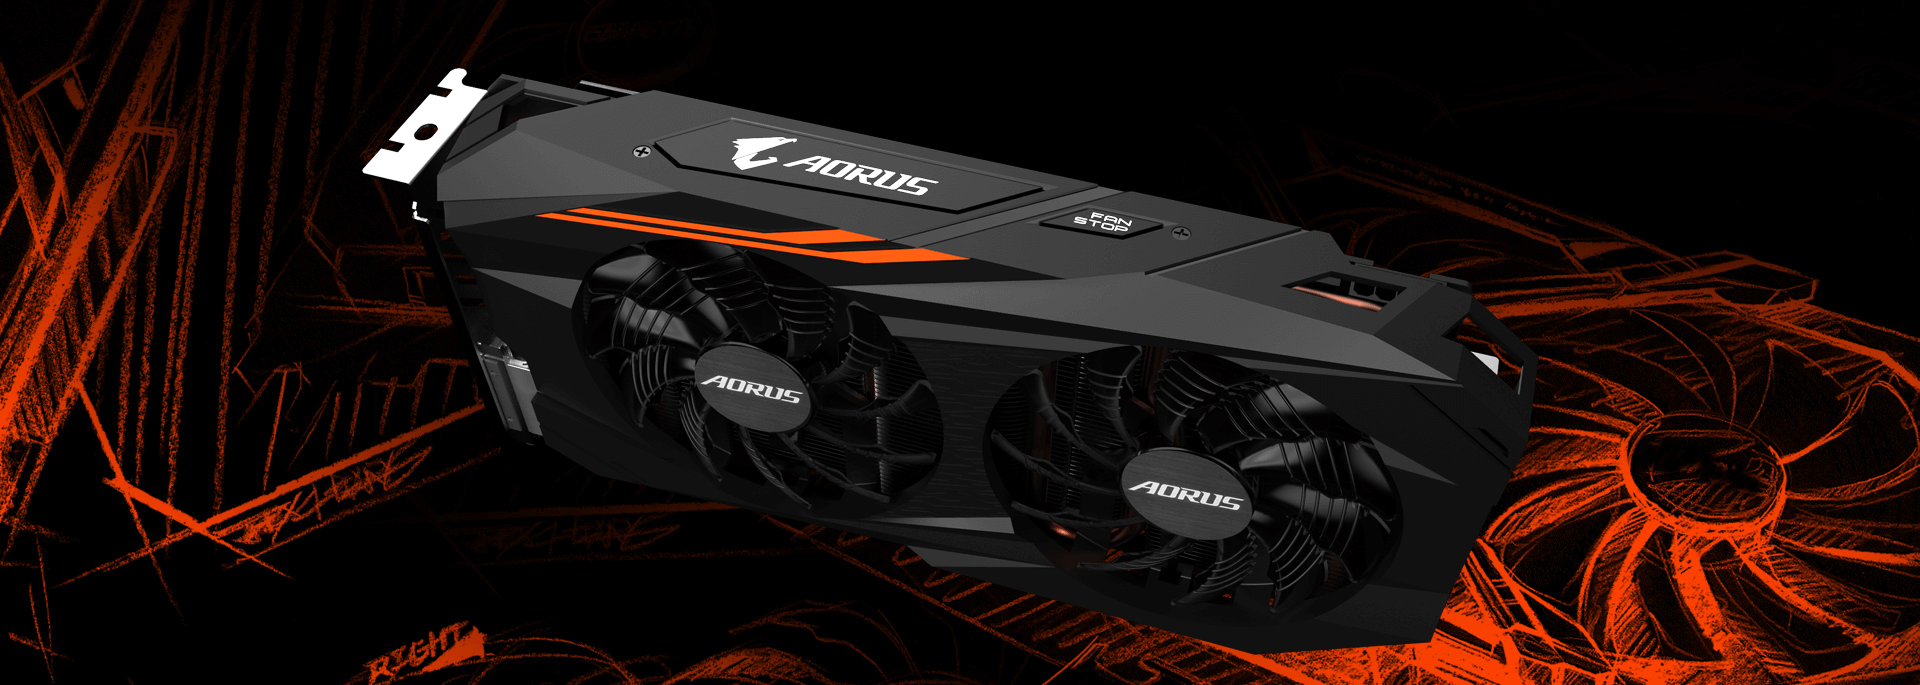 AORUS Radeon™ RX580 4G (rev  1 0/1 1) | Graphics Card - GIGABYTE U S A